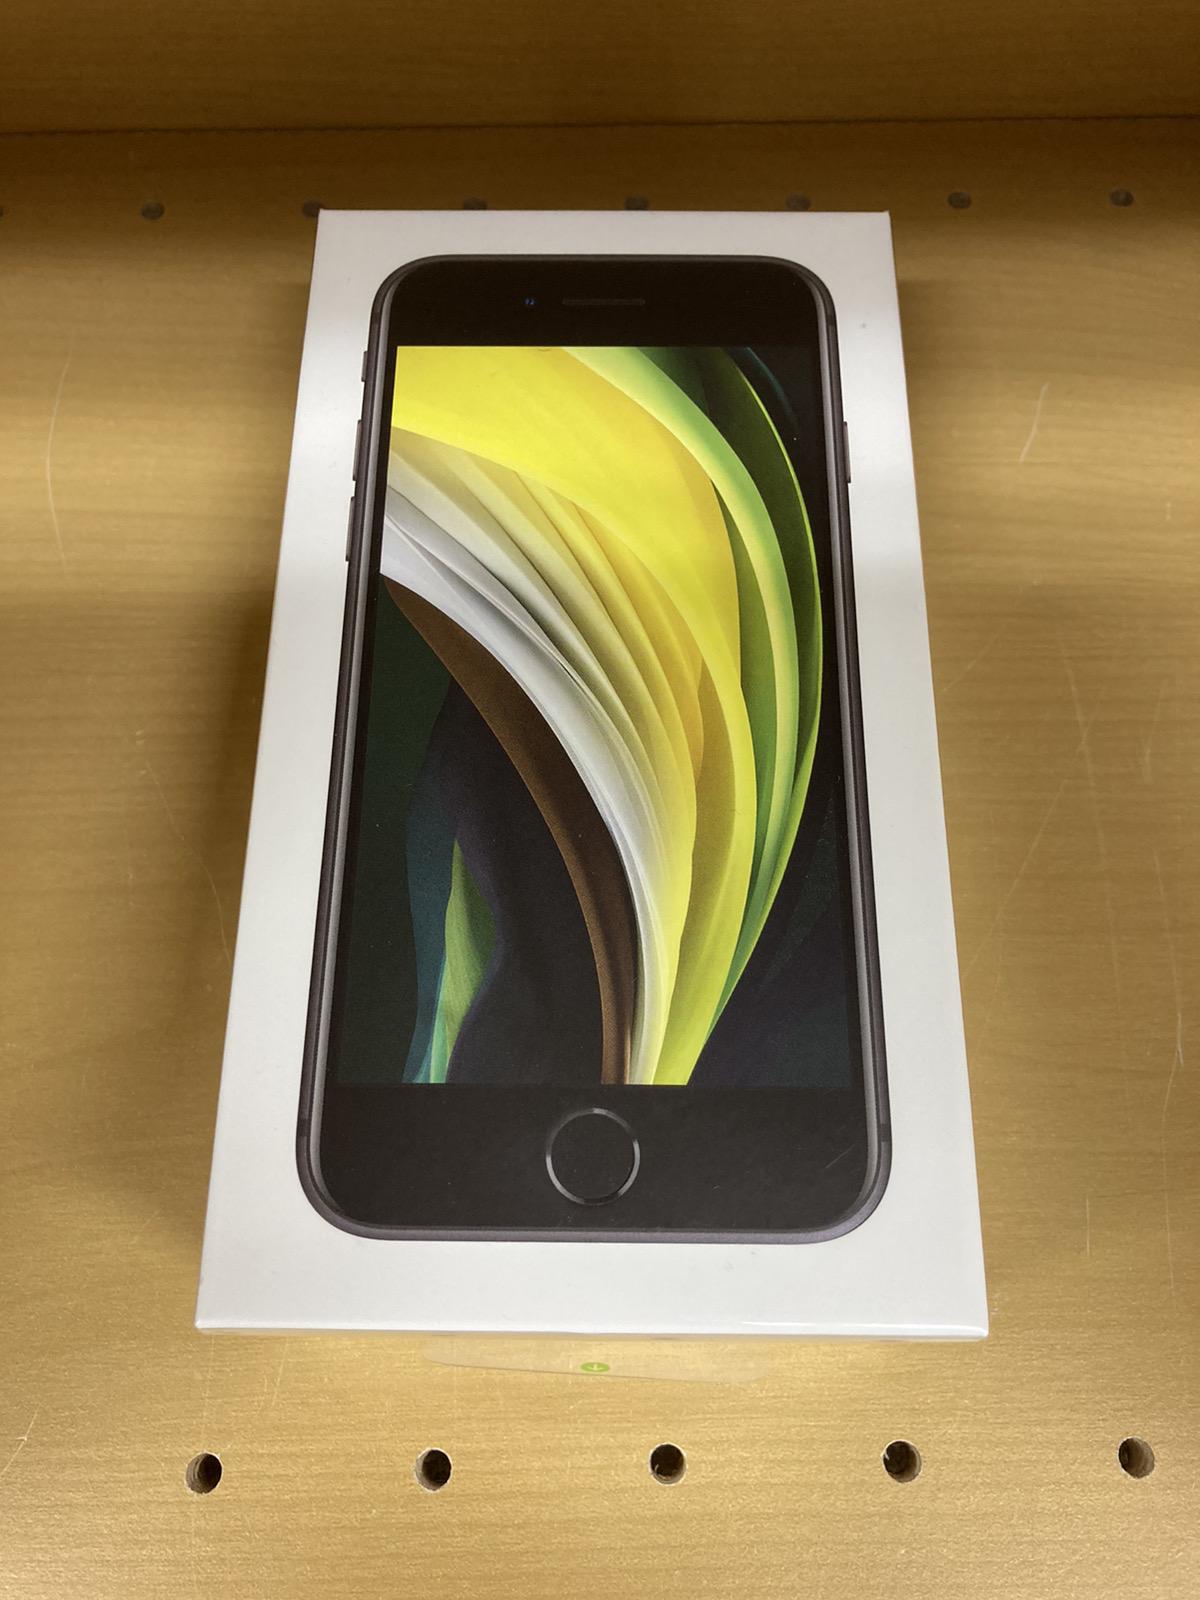 iPhoneSE 第2世代 128GB SIMフリー 新品未開封